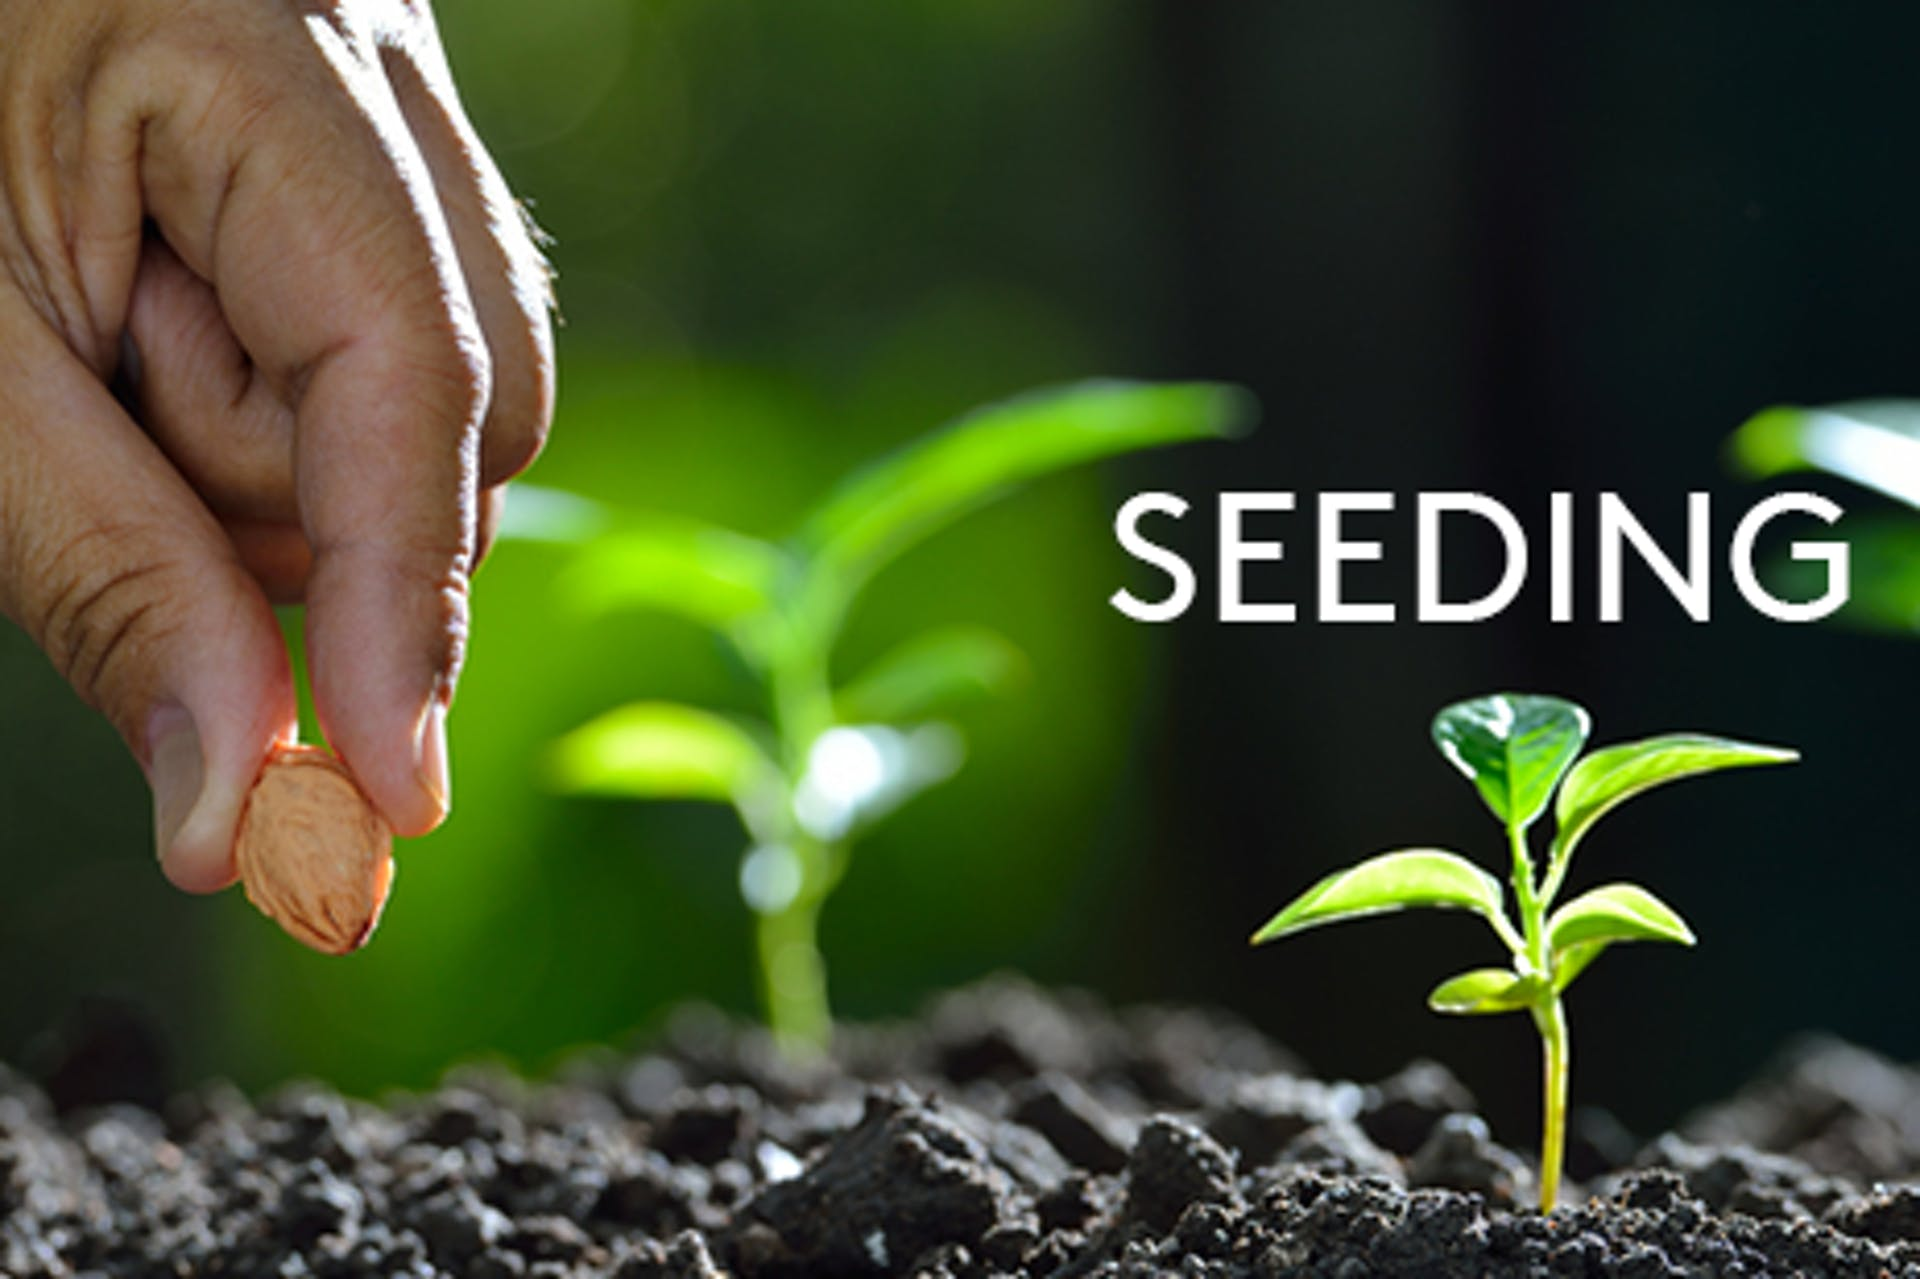 Foto Samen pflanzen Aufschrift Seeding